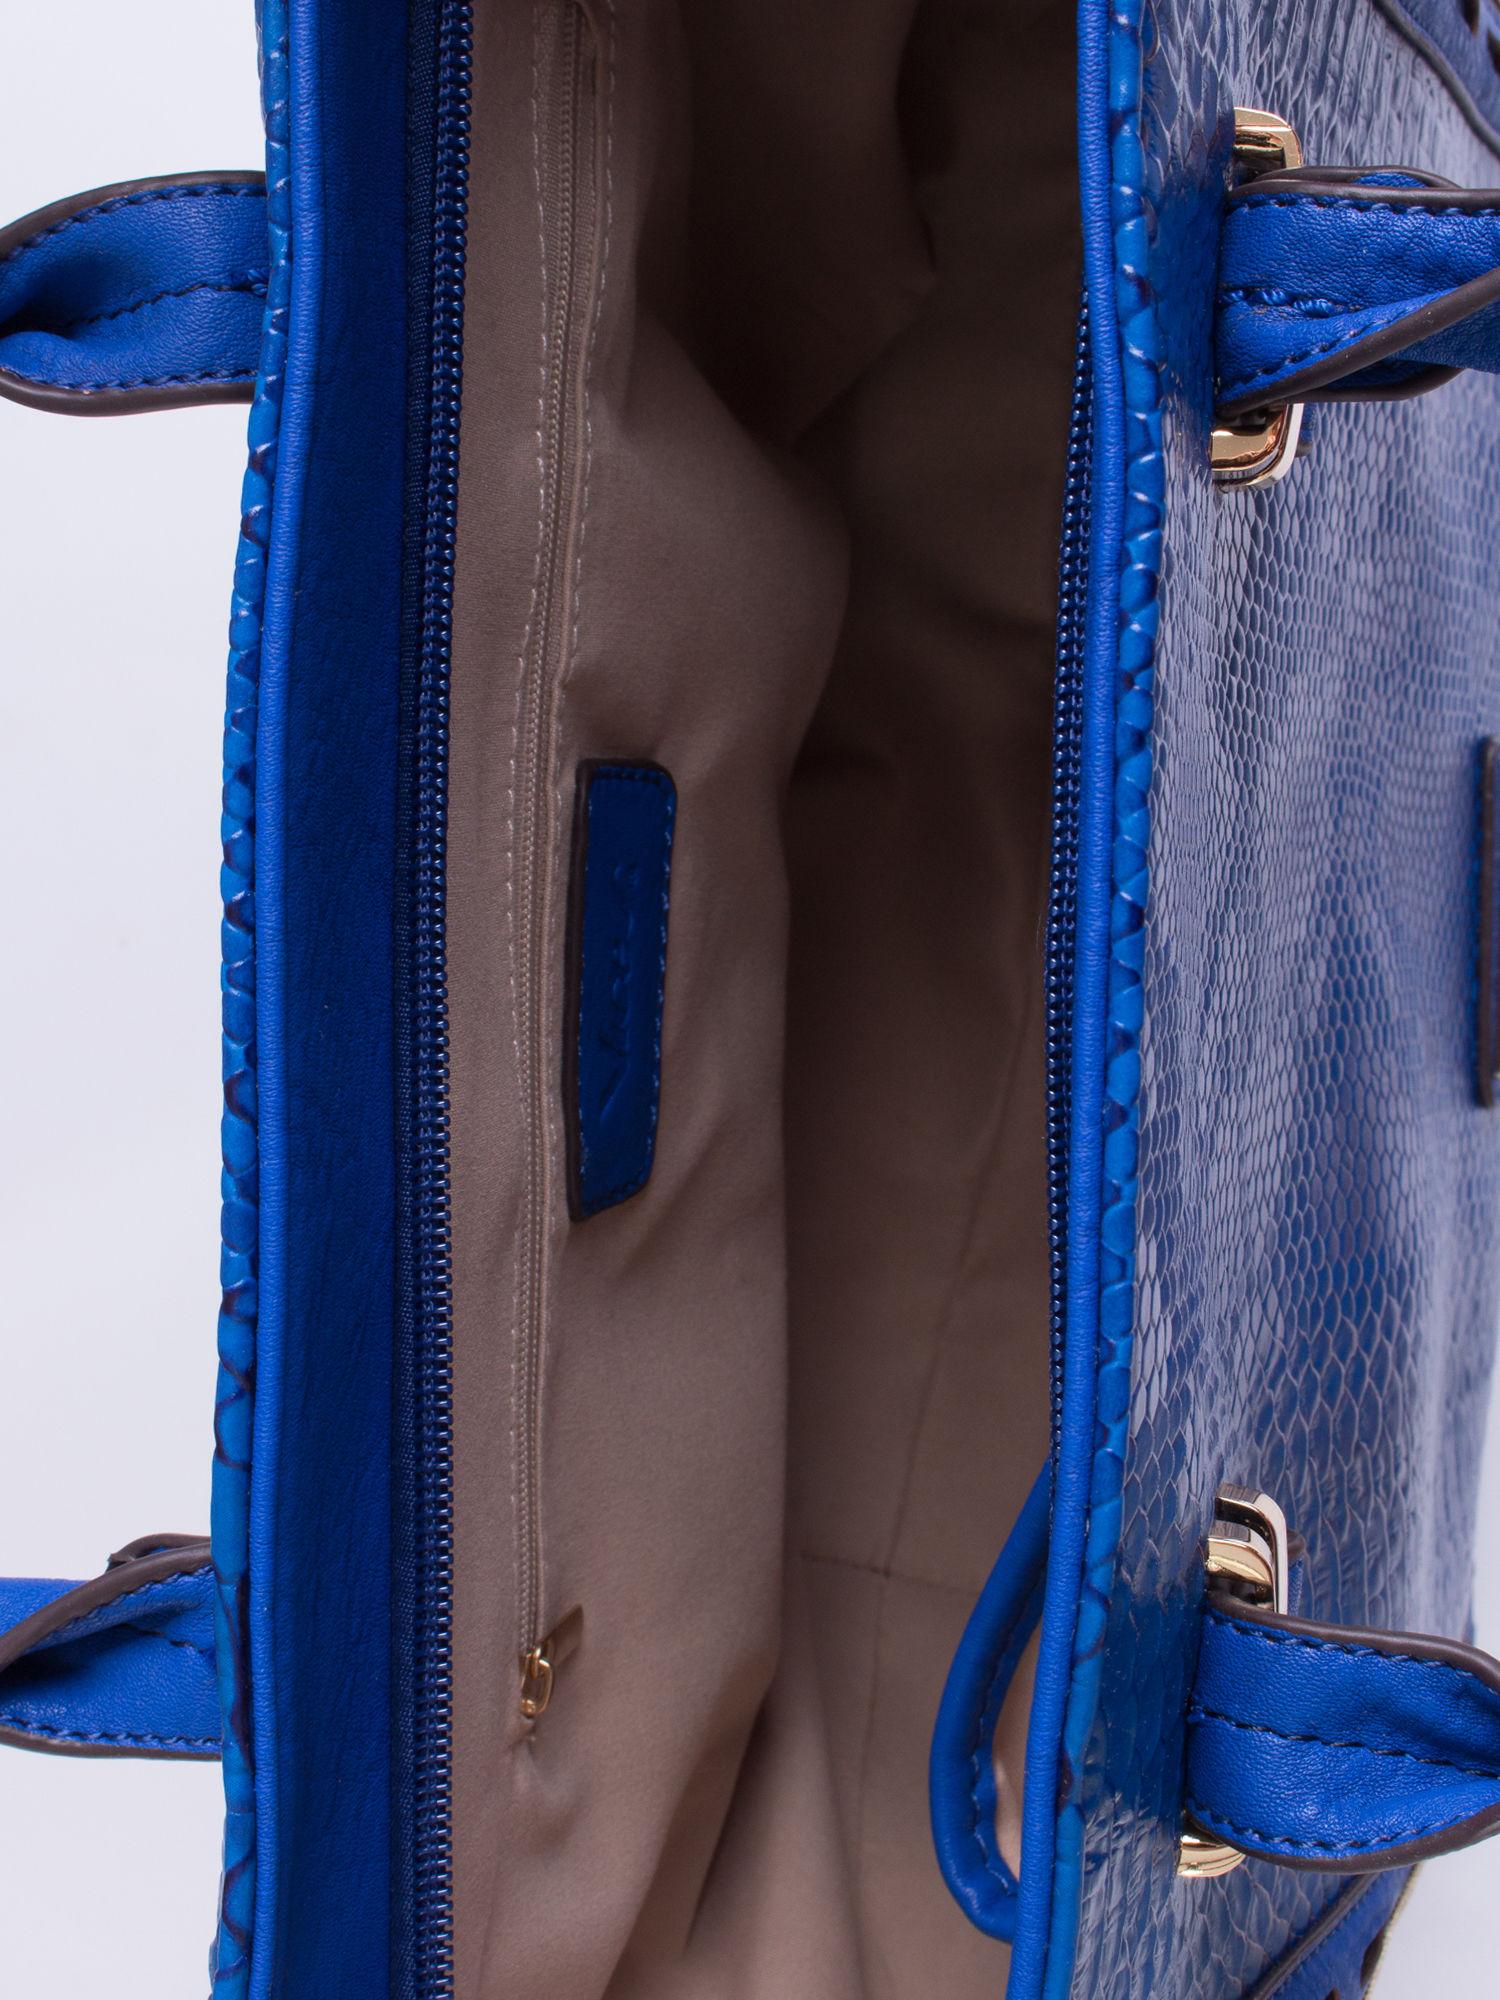 Niebieska torba shopper bag z wzorem skóry węża                                  zdj.                                  4